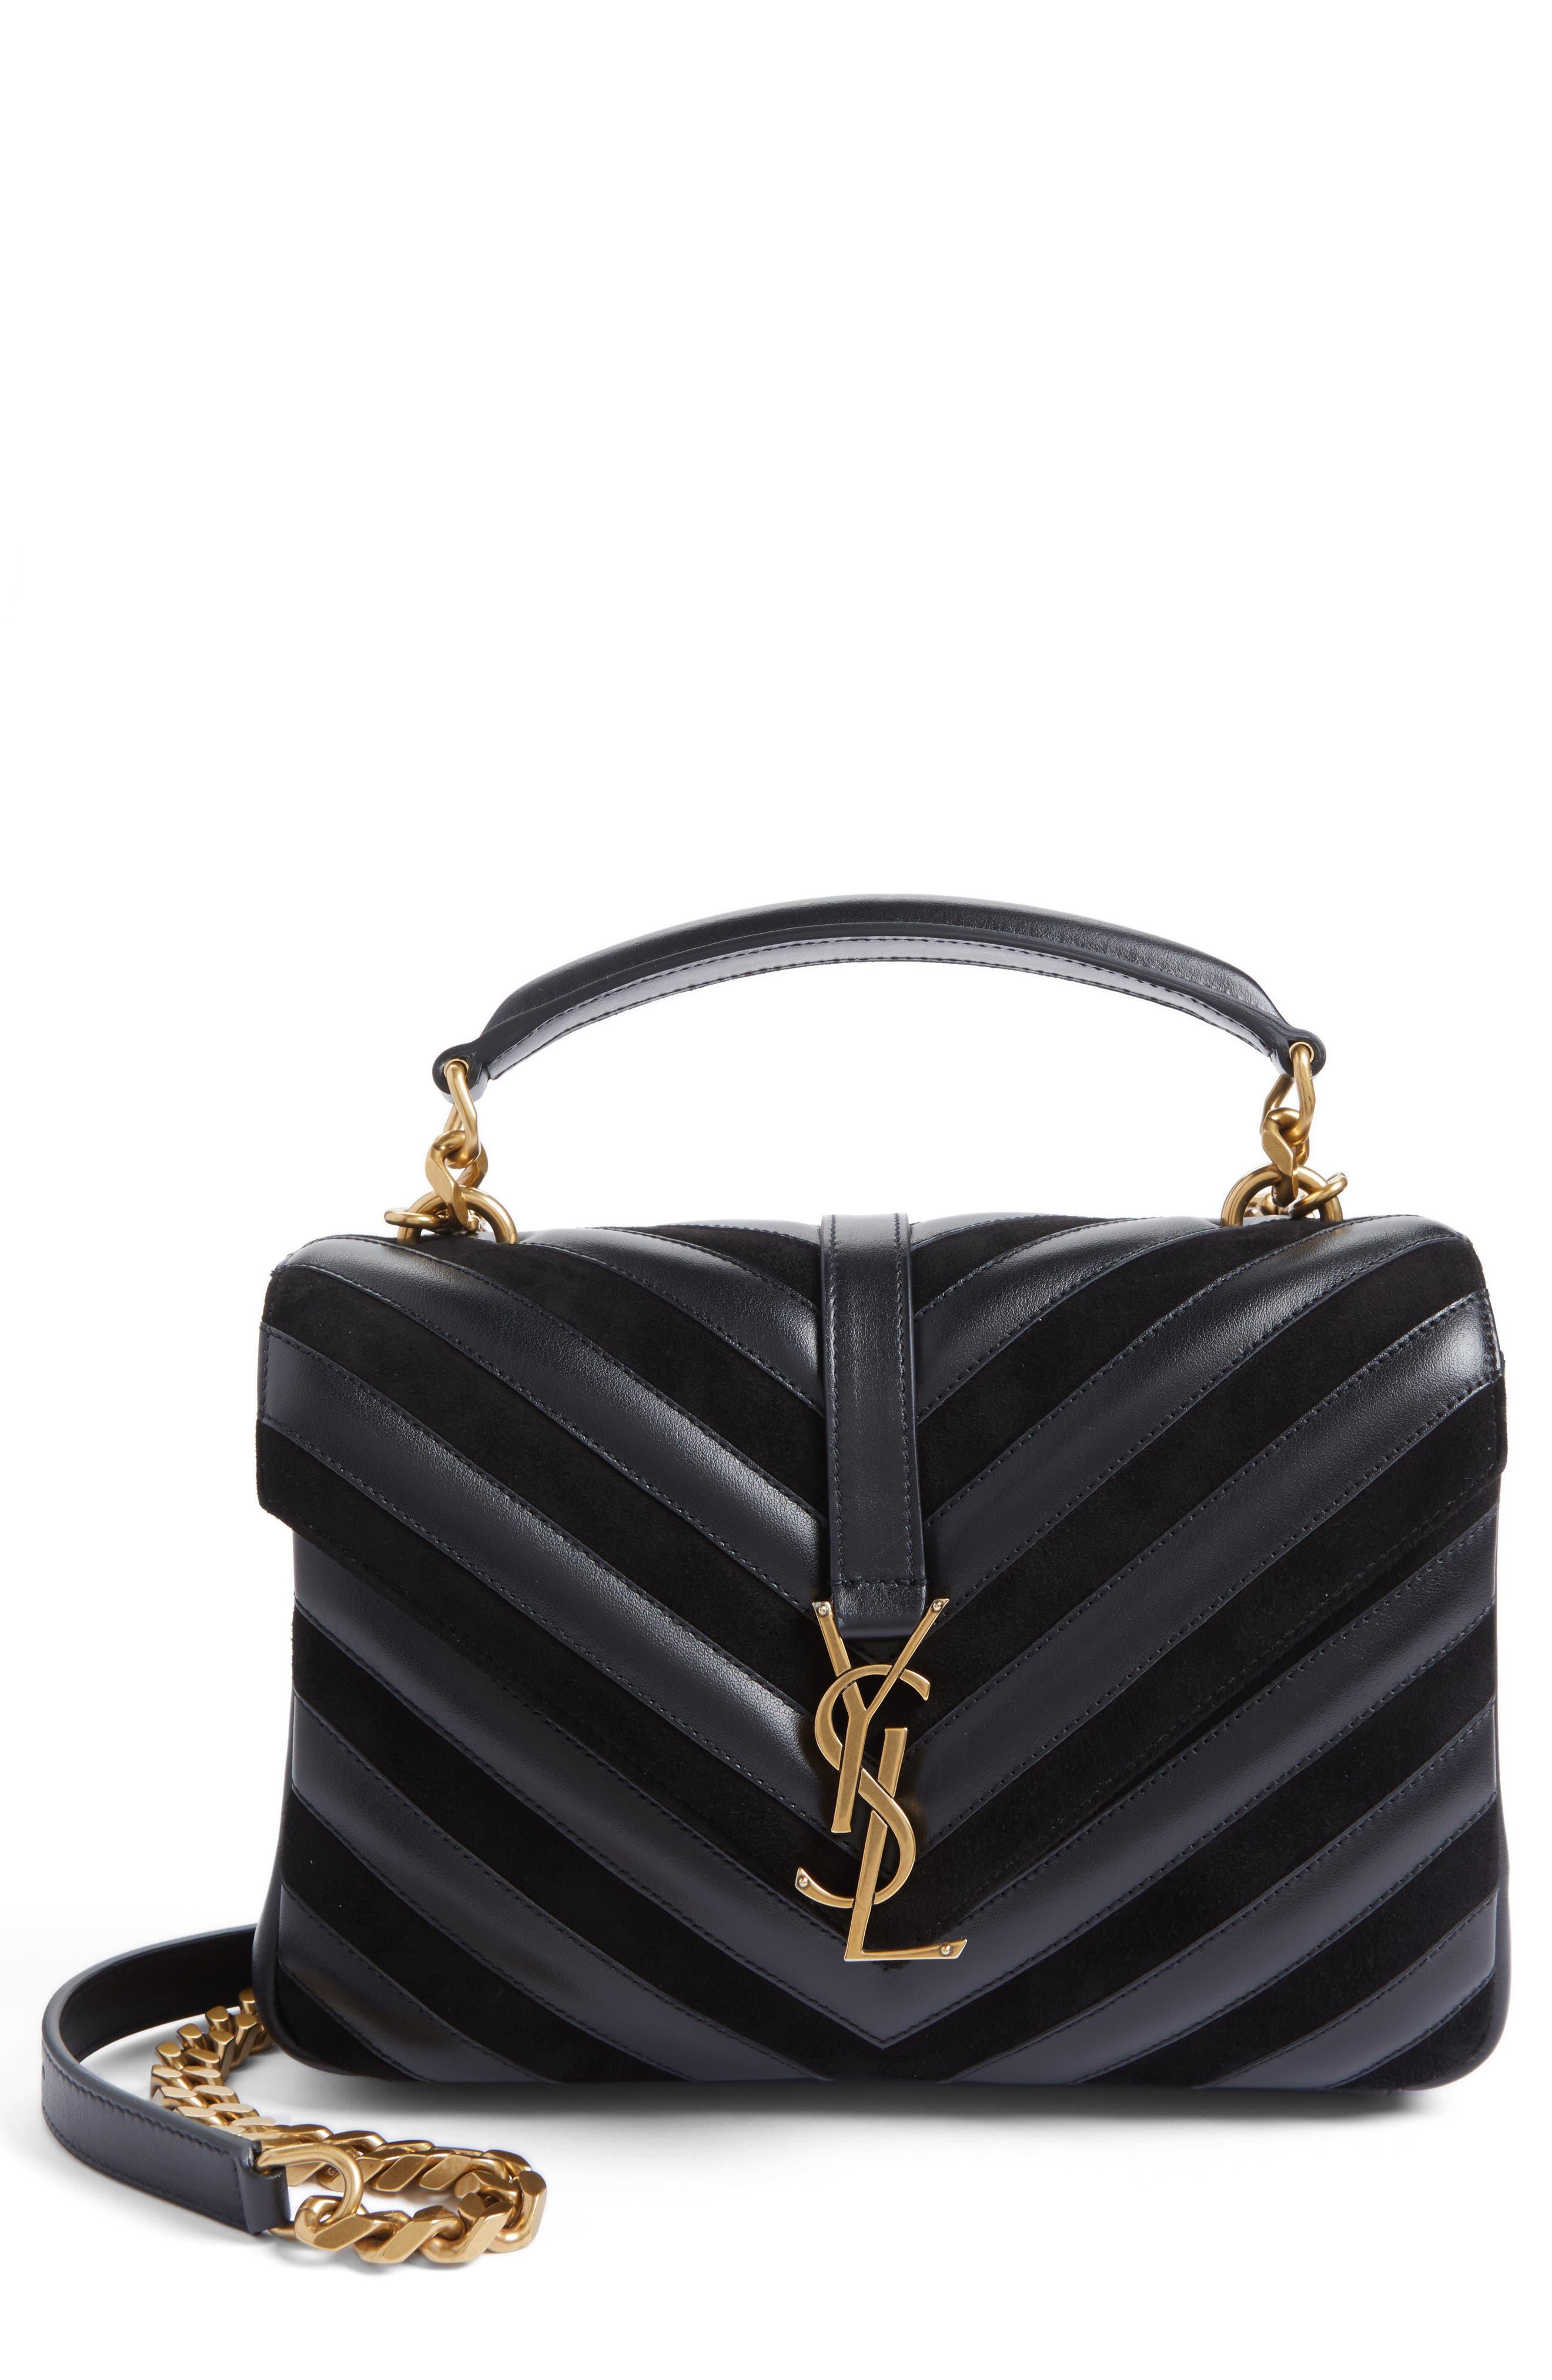 Saint Laurent Medium College Patchwork Suede & Leather Shoulder Bag